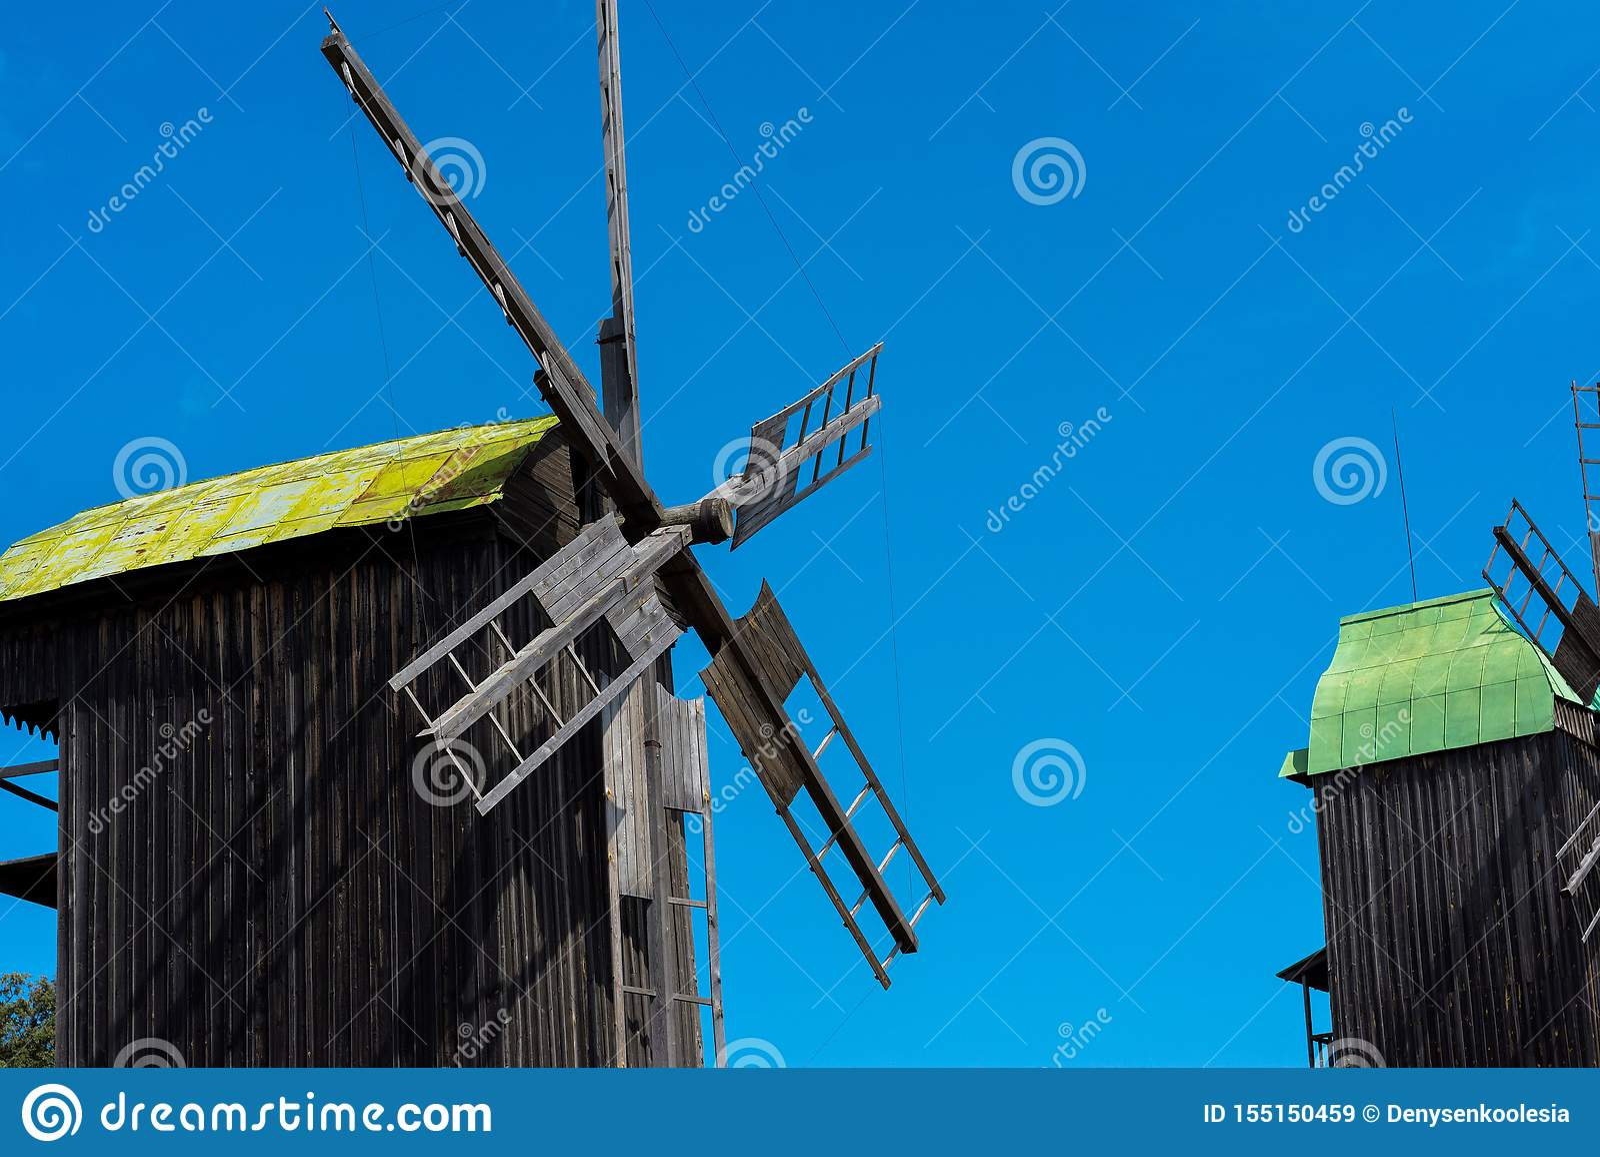 Best photo of windmill on blue sky background. Ukrainian windmill